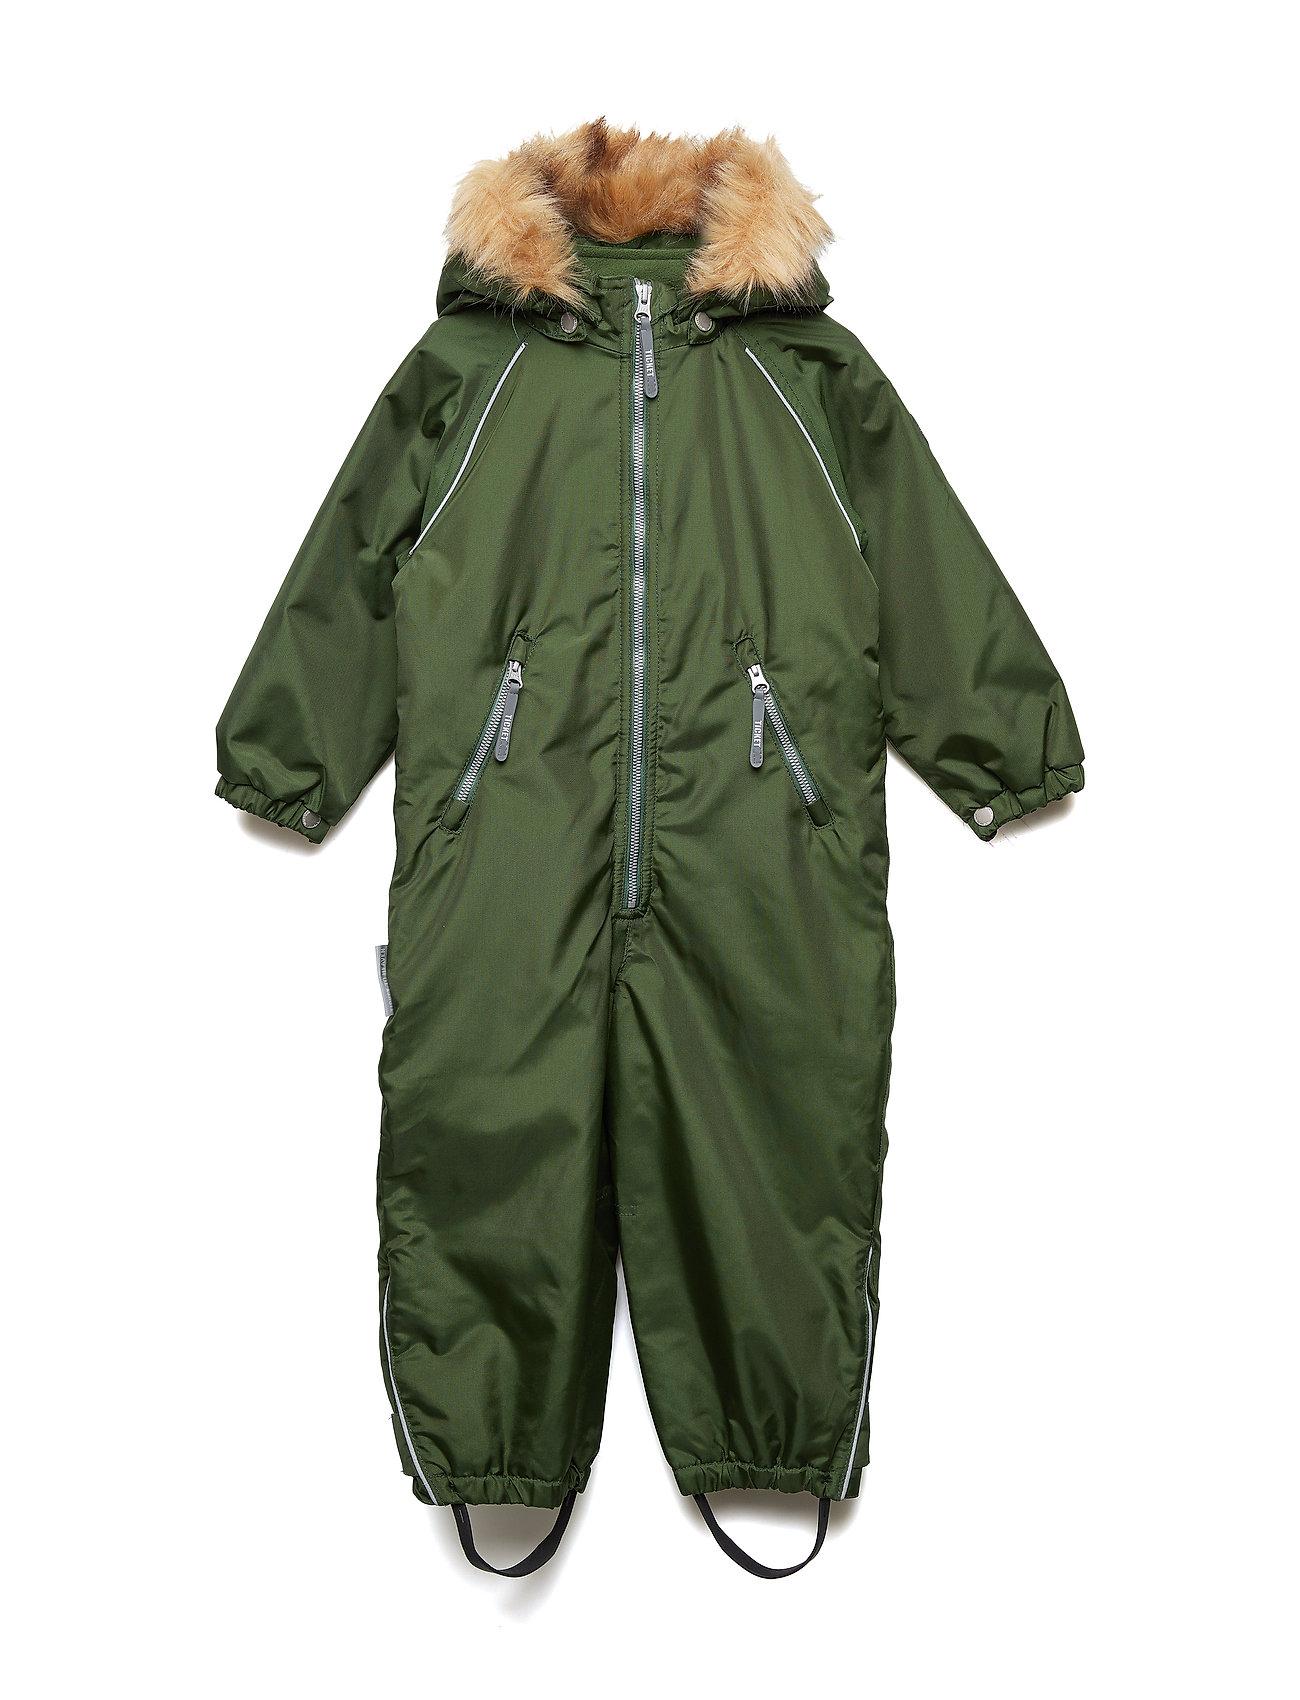 bffcbb2056a Suit Snowbaggie With Detachable Hood Flyverdragt Overtøj Grøn TICKET TO  HEAVEN